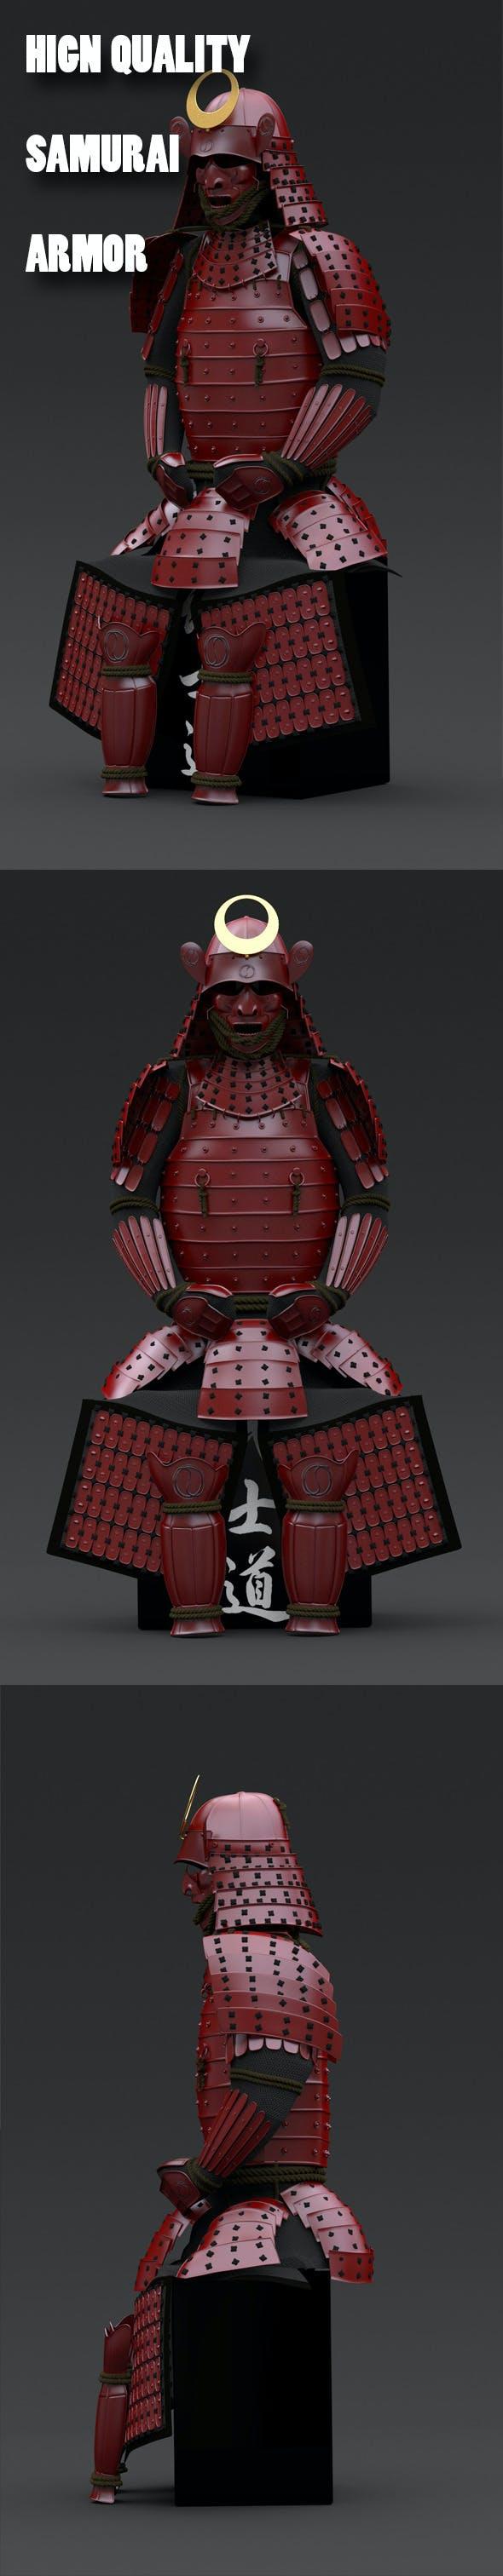 Samurai Armor - 3DOcean Item for Sale